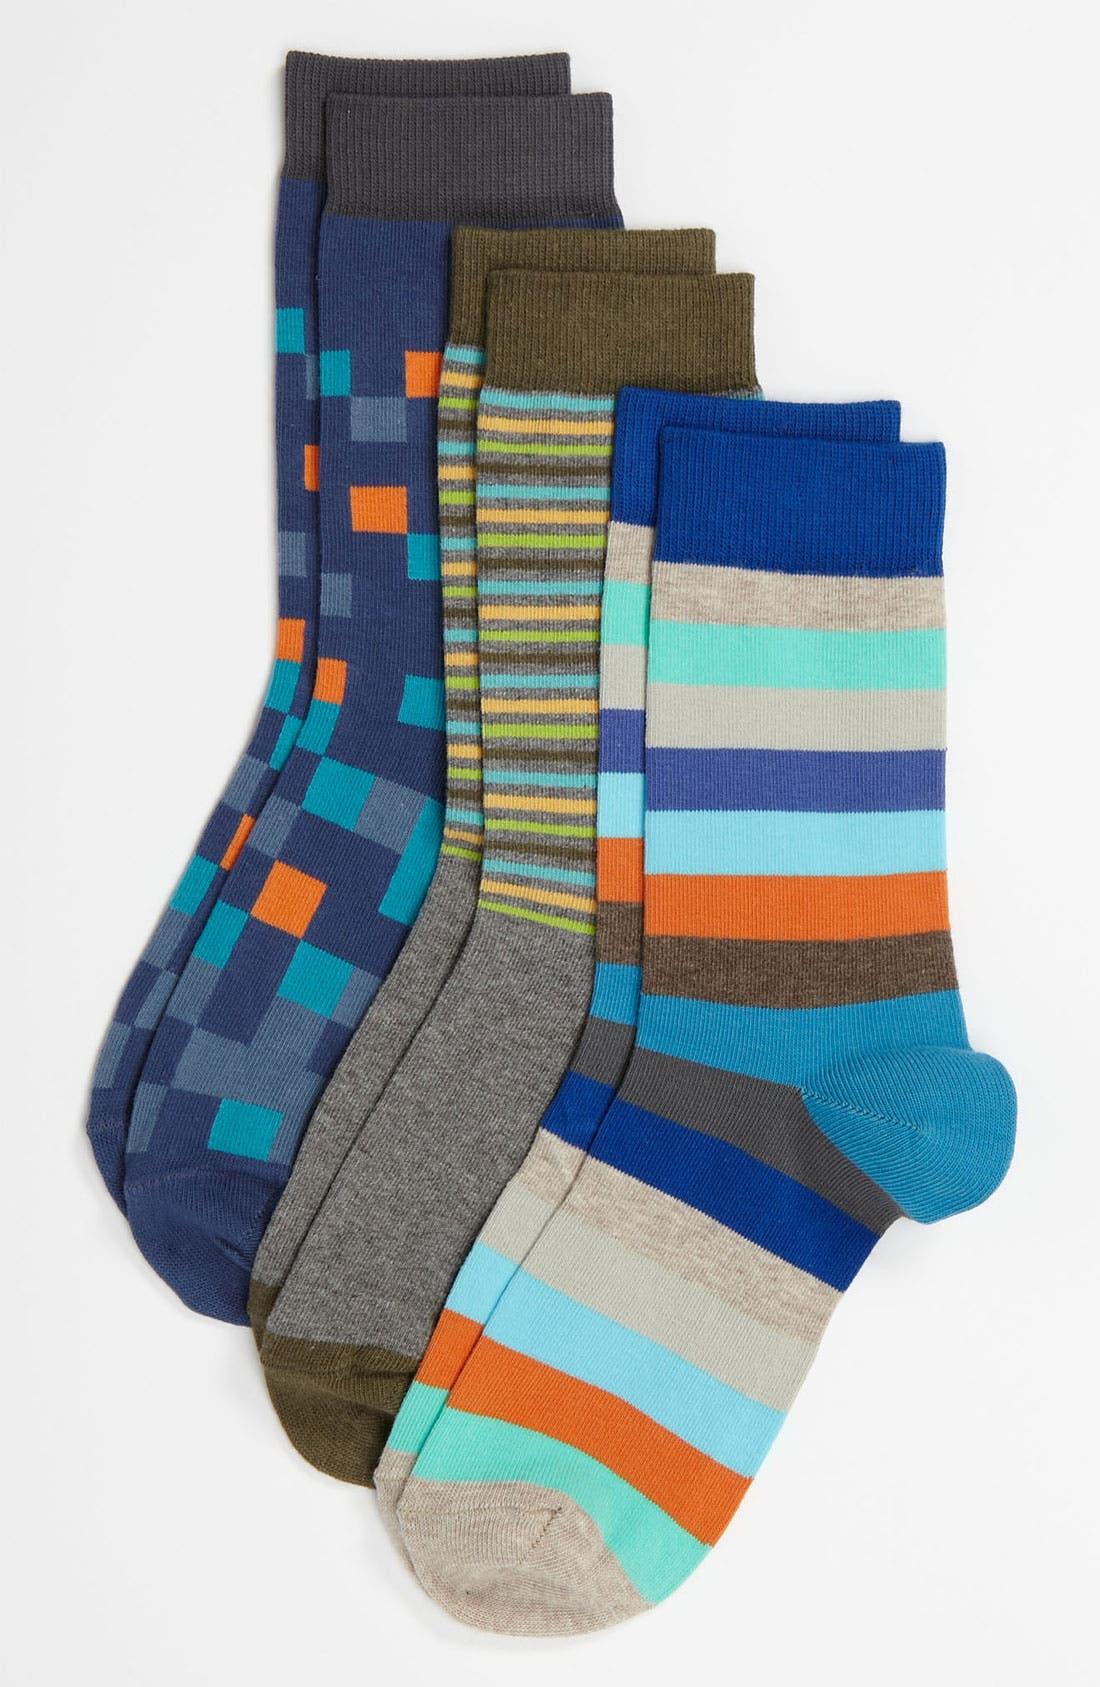 Alternate Image 1 Selected - Nordstrom 'Pixel Mix' Crew Socks (3-Pack) (Kids)